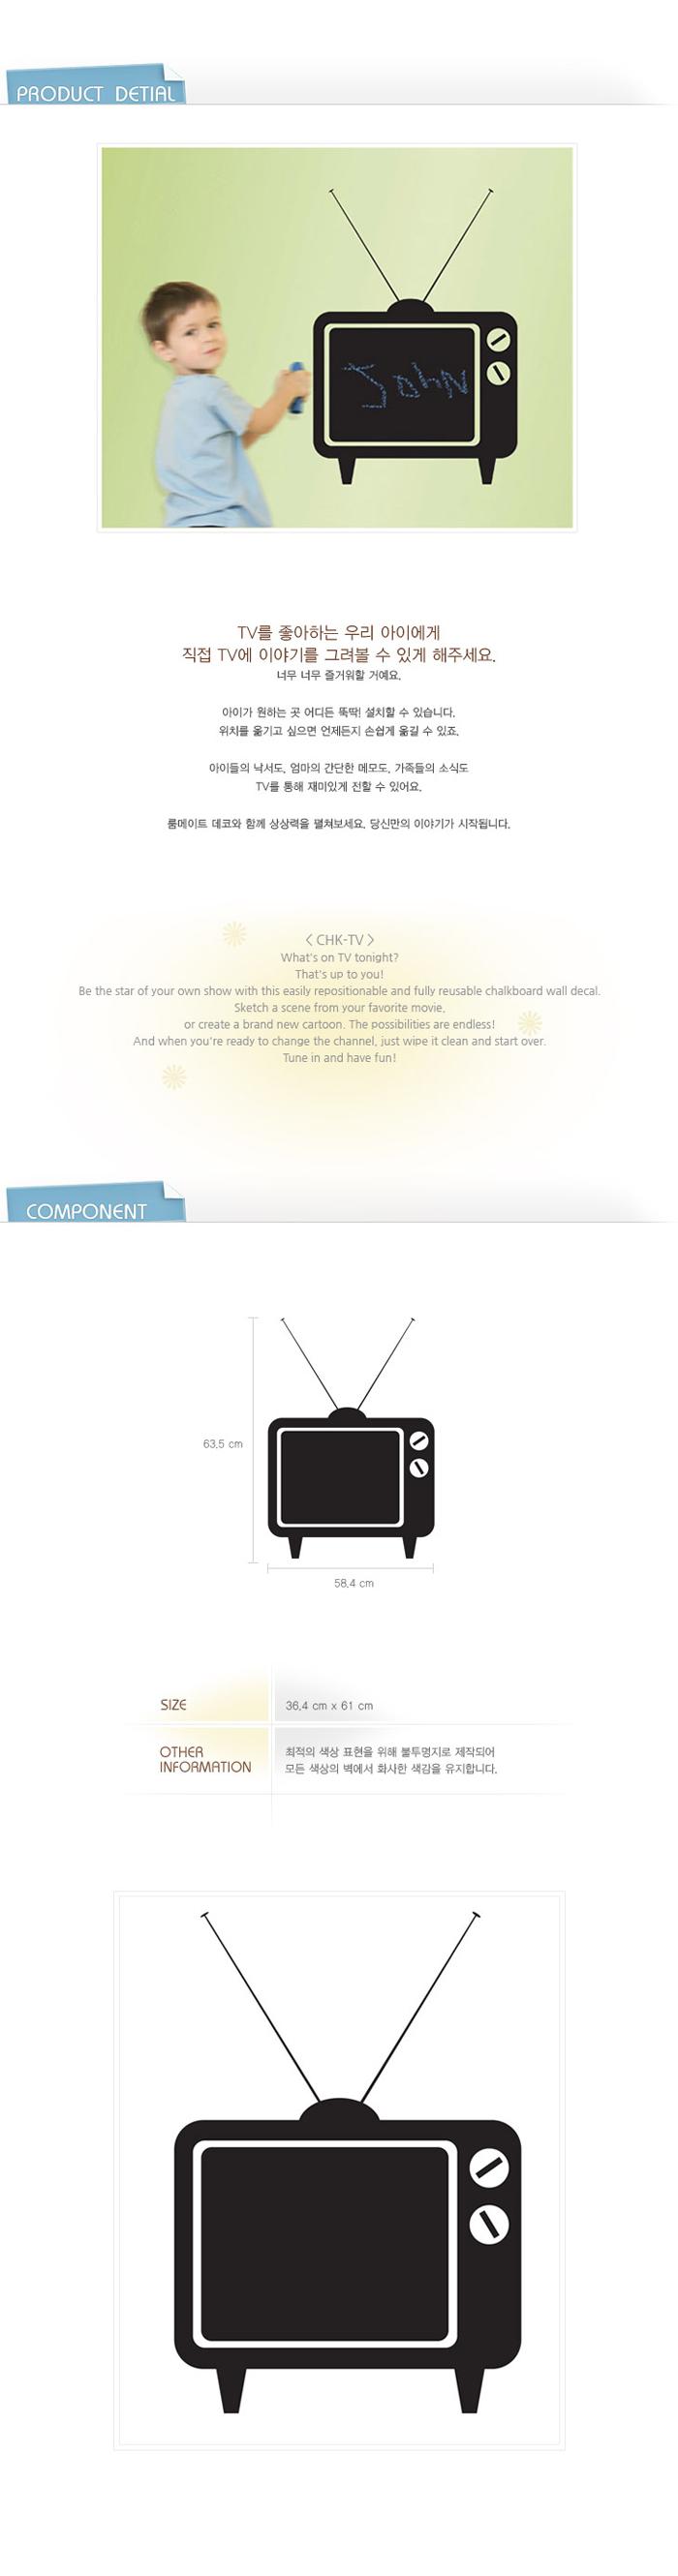 TV형 초크보드 바보사랑 디자인소품 쇼핑몰,룸메이트 화이트보드 ...